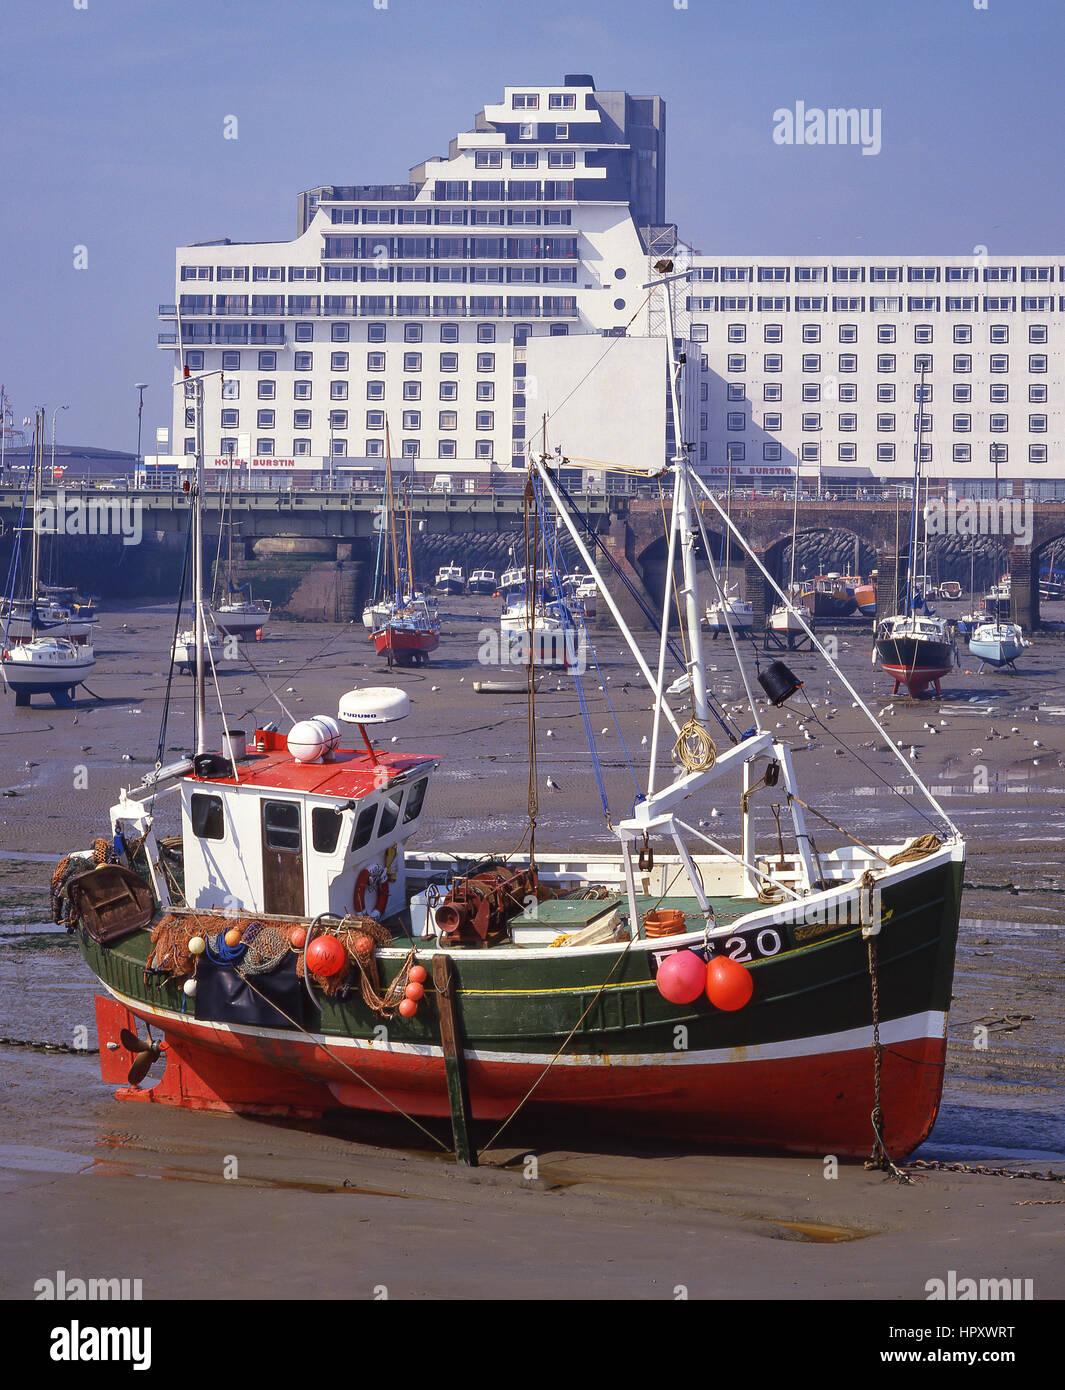 Grand Burstin Hotel from harbour, Folkestone, Kent, England, United Kingdom - Stock Image